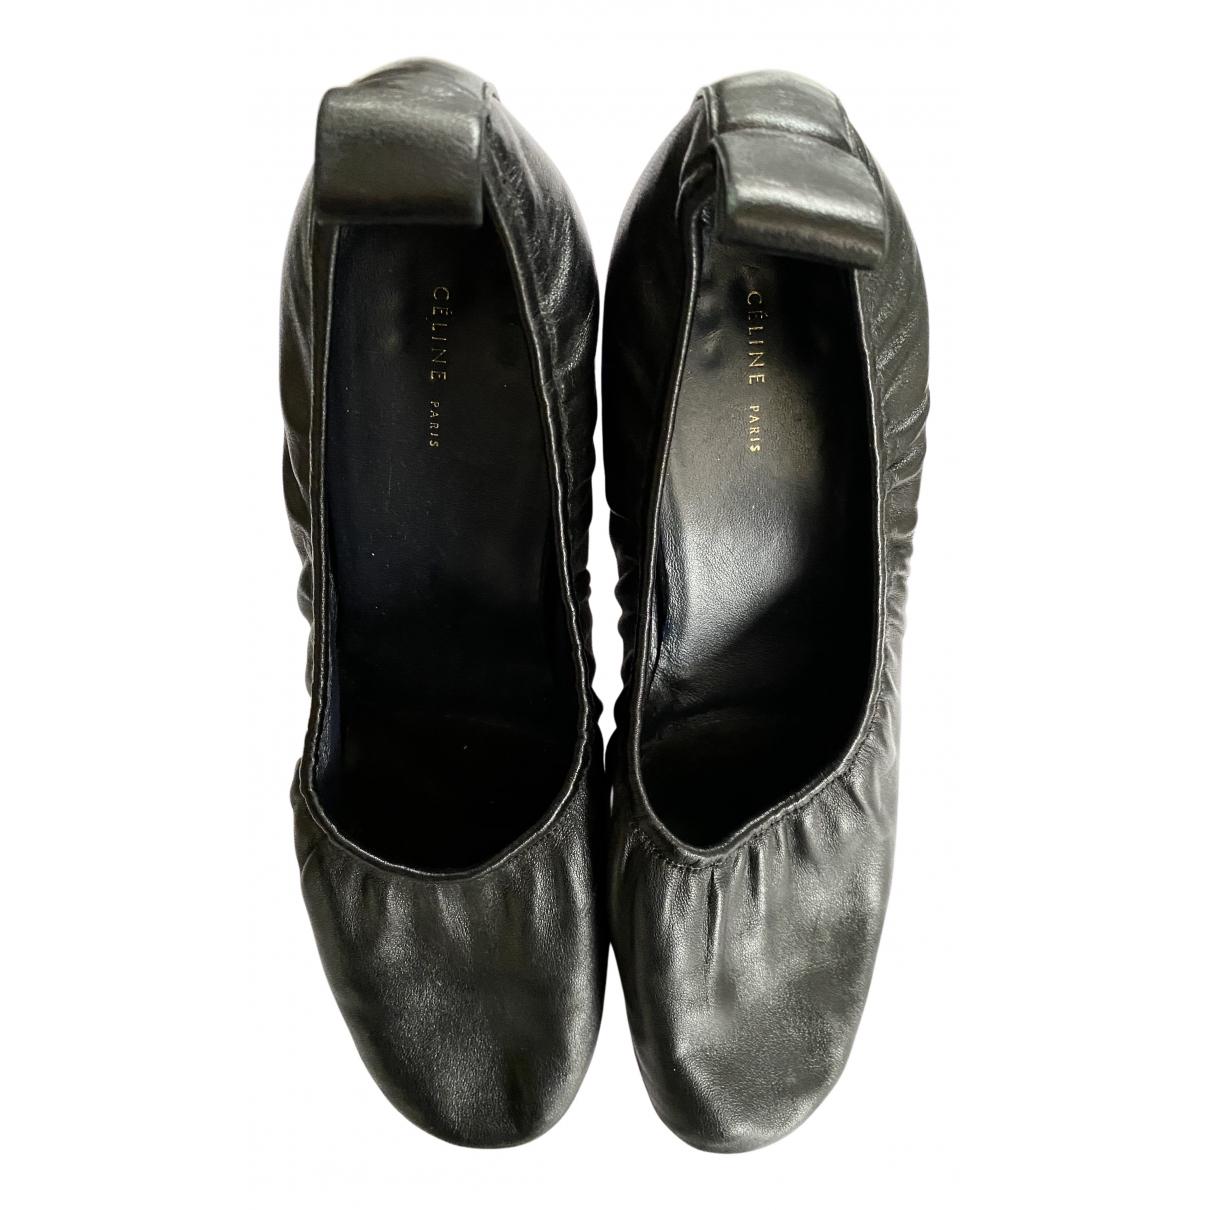 Celine Soft Ballerina Black Leather Heels for Women 38.5 EU